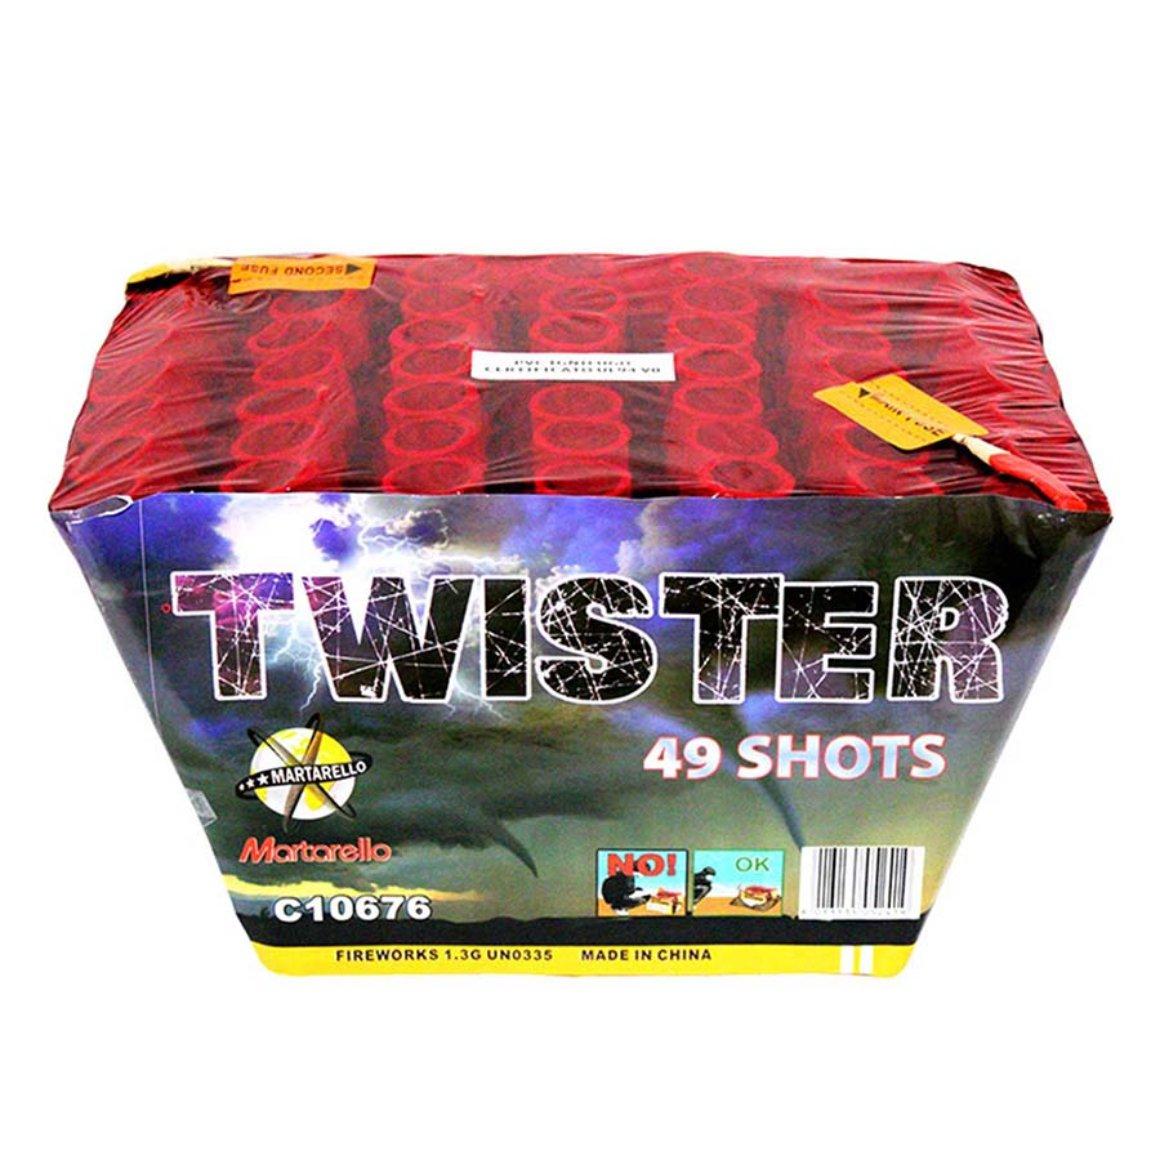 Twister C10676